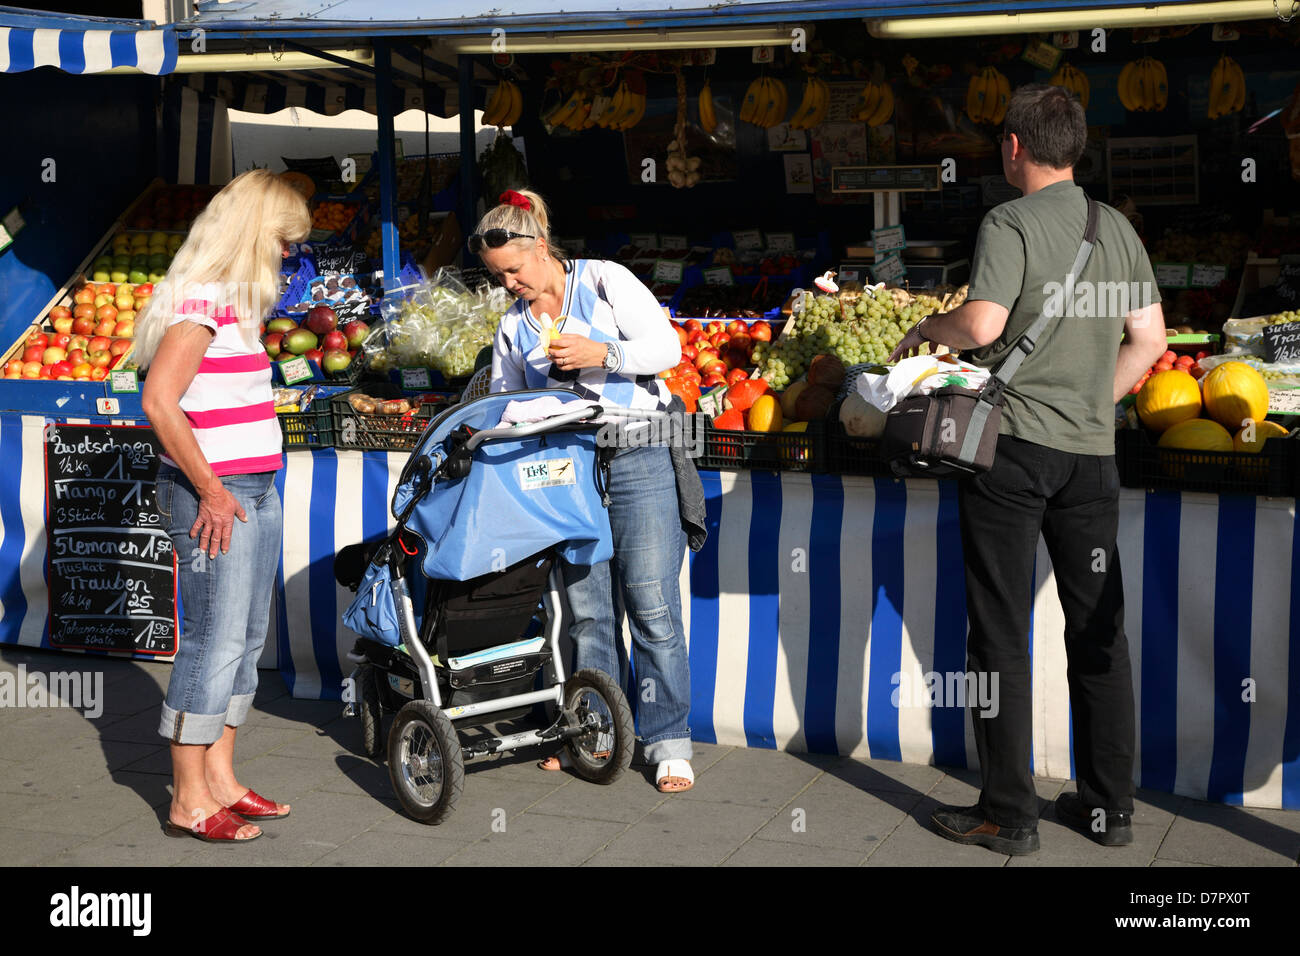 Fruit stall at Leopoldstrasse, Munich, Bavaria, Germany - Stock Image